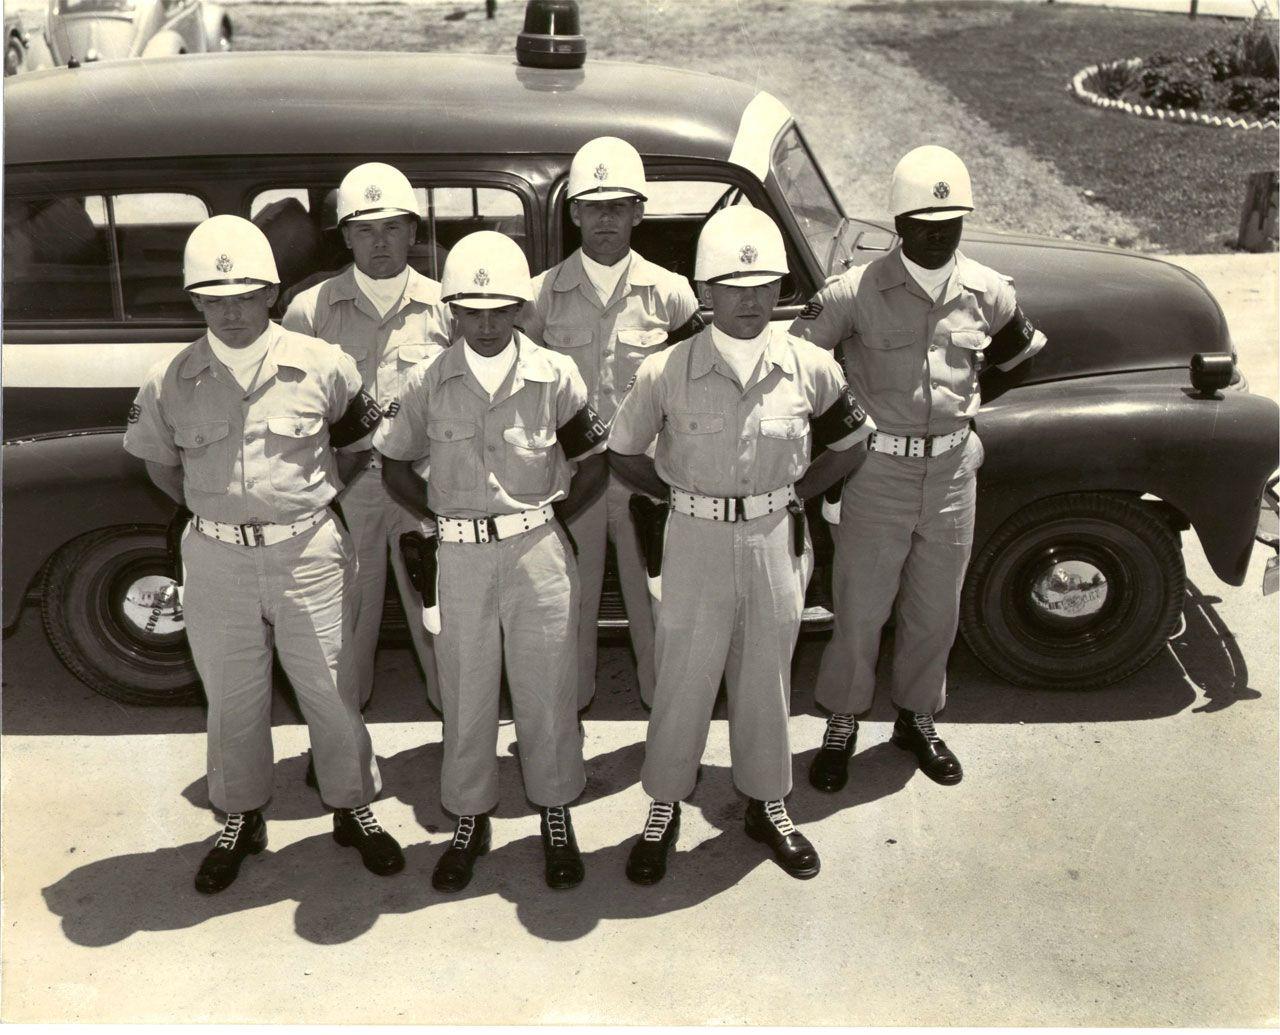 U.S.A.F. Air Policeman & patrol vehicle (1950's) The